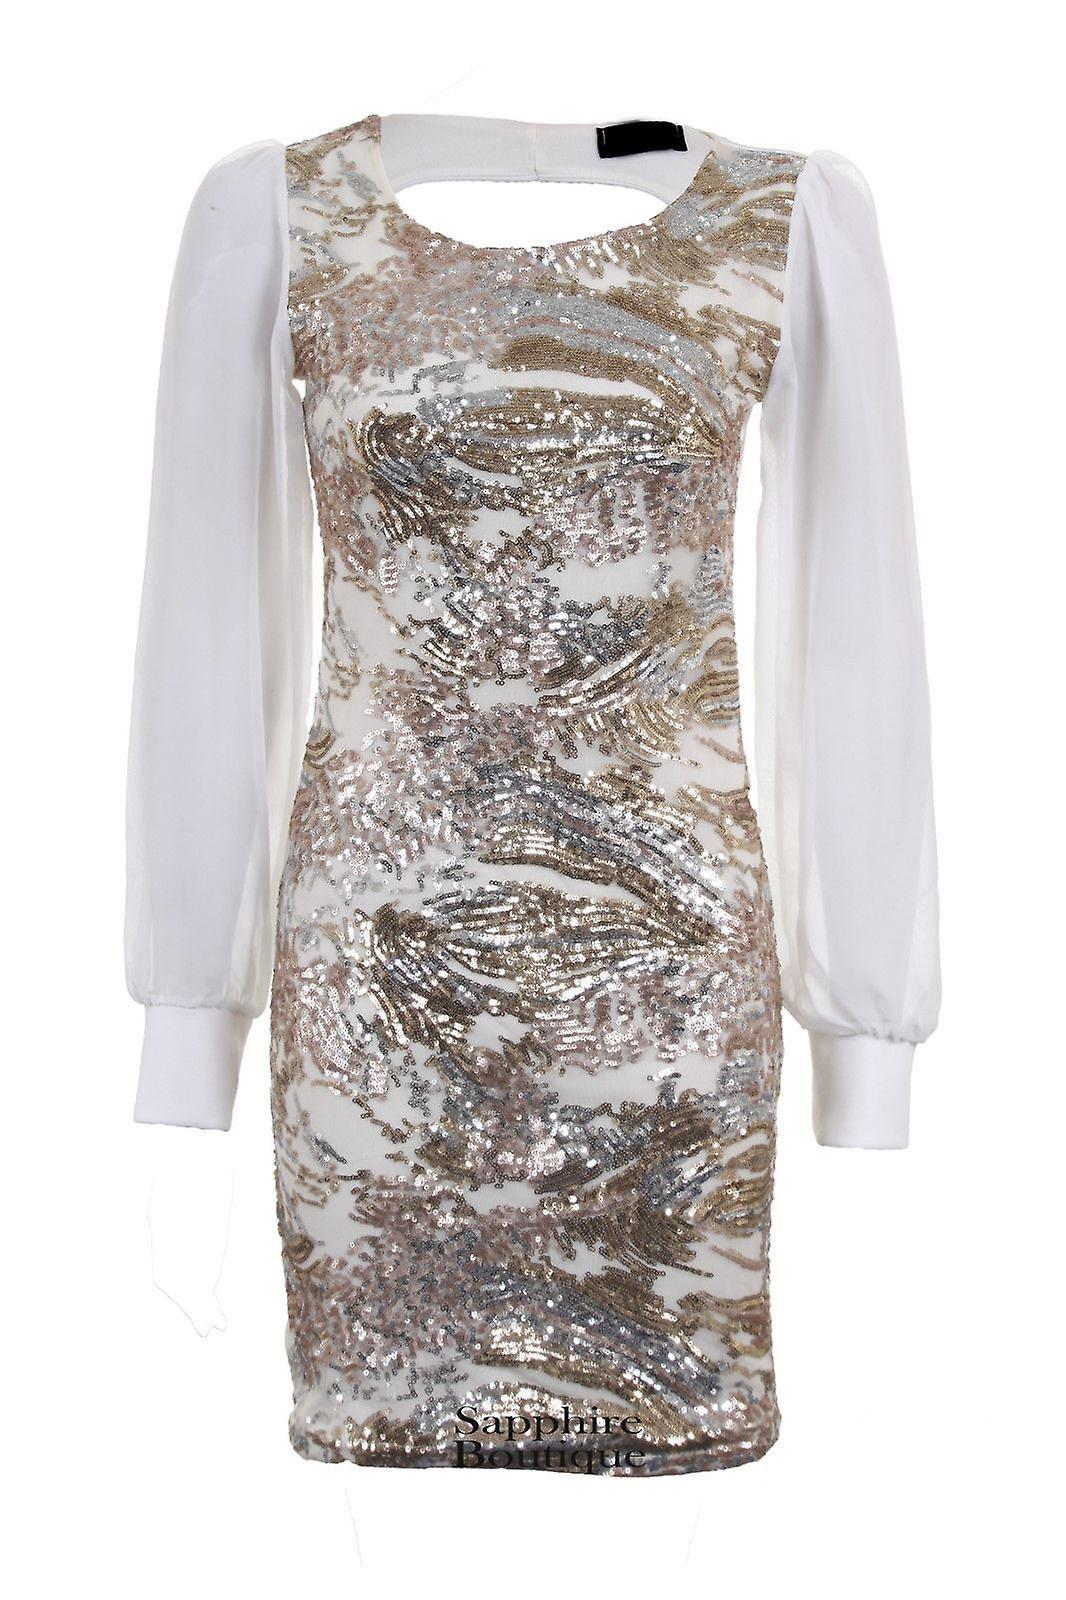 Ladies Long Sleeve Chiffon Silver Black Gold Women's Bodycon Sexy Party Dress